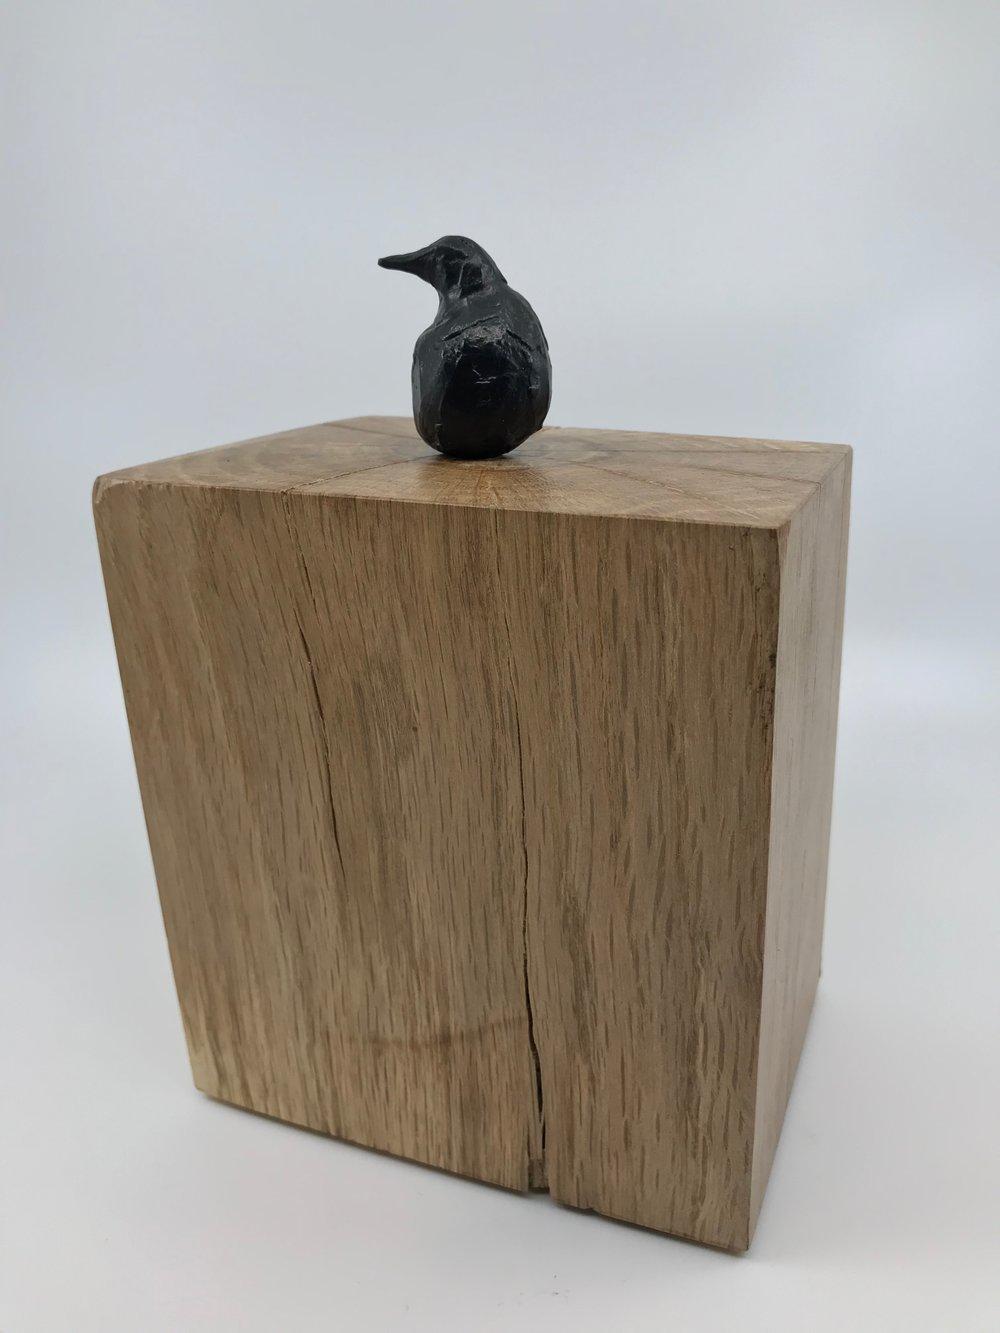 Bird Form 1 on Perch, 2018